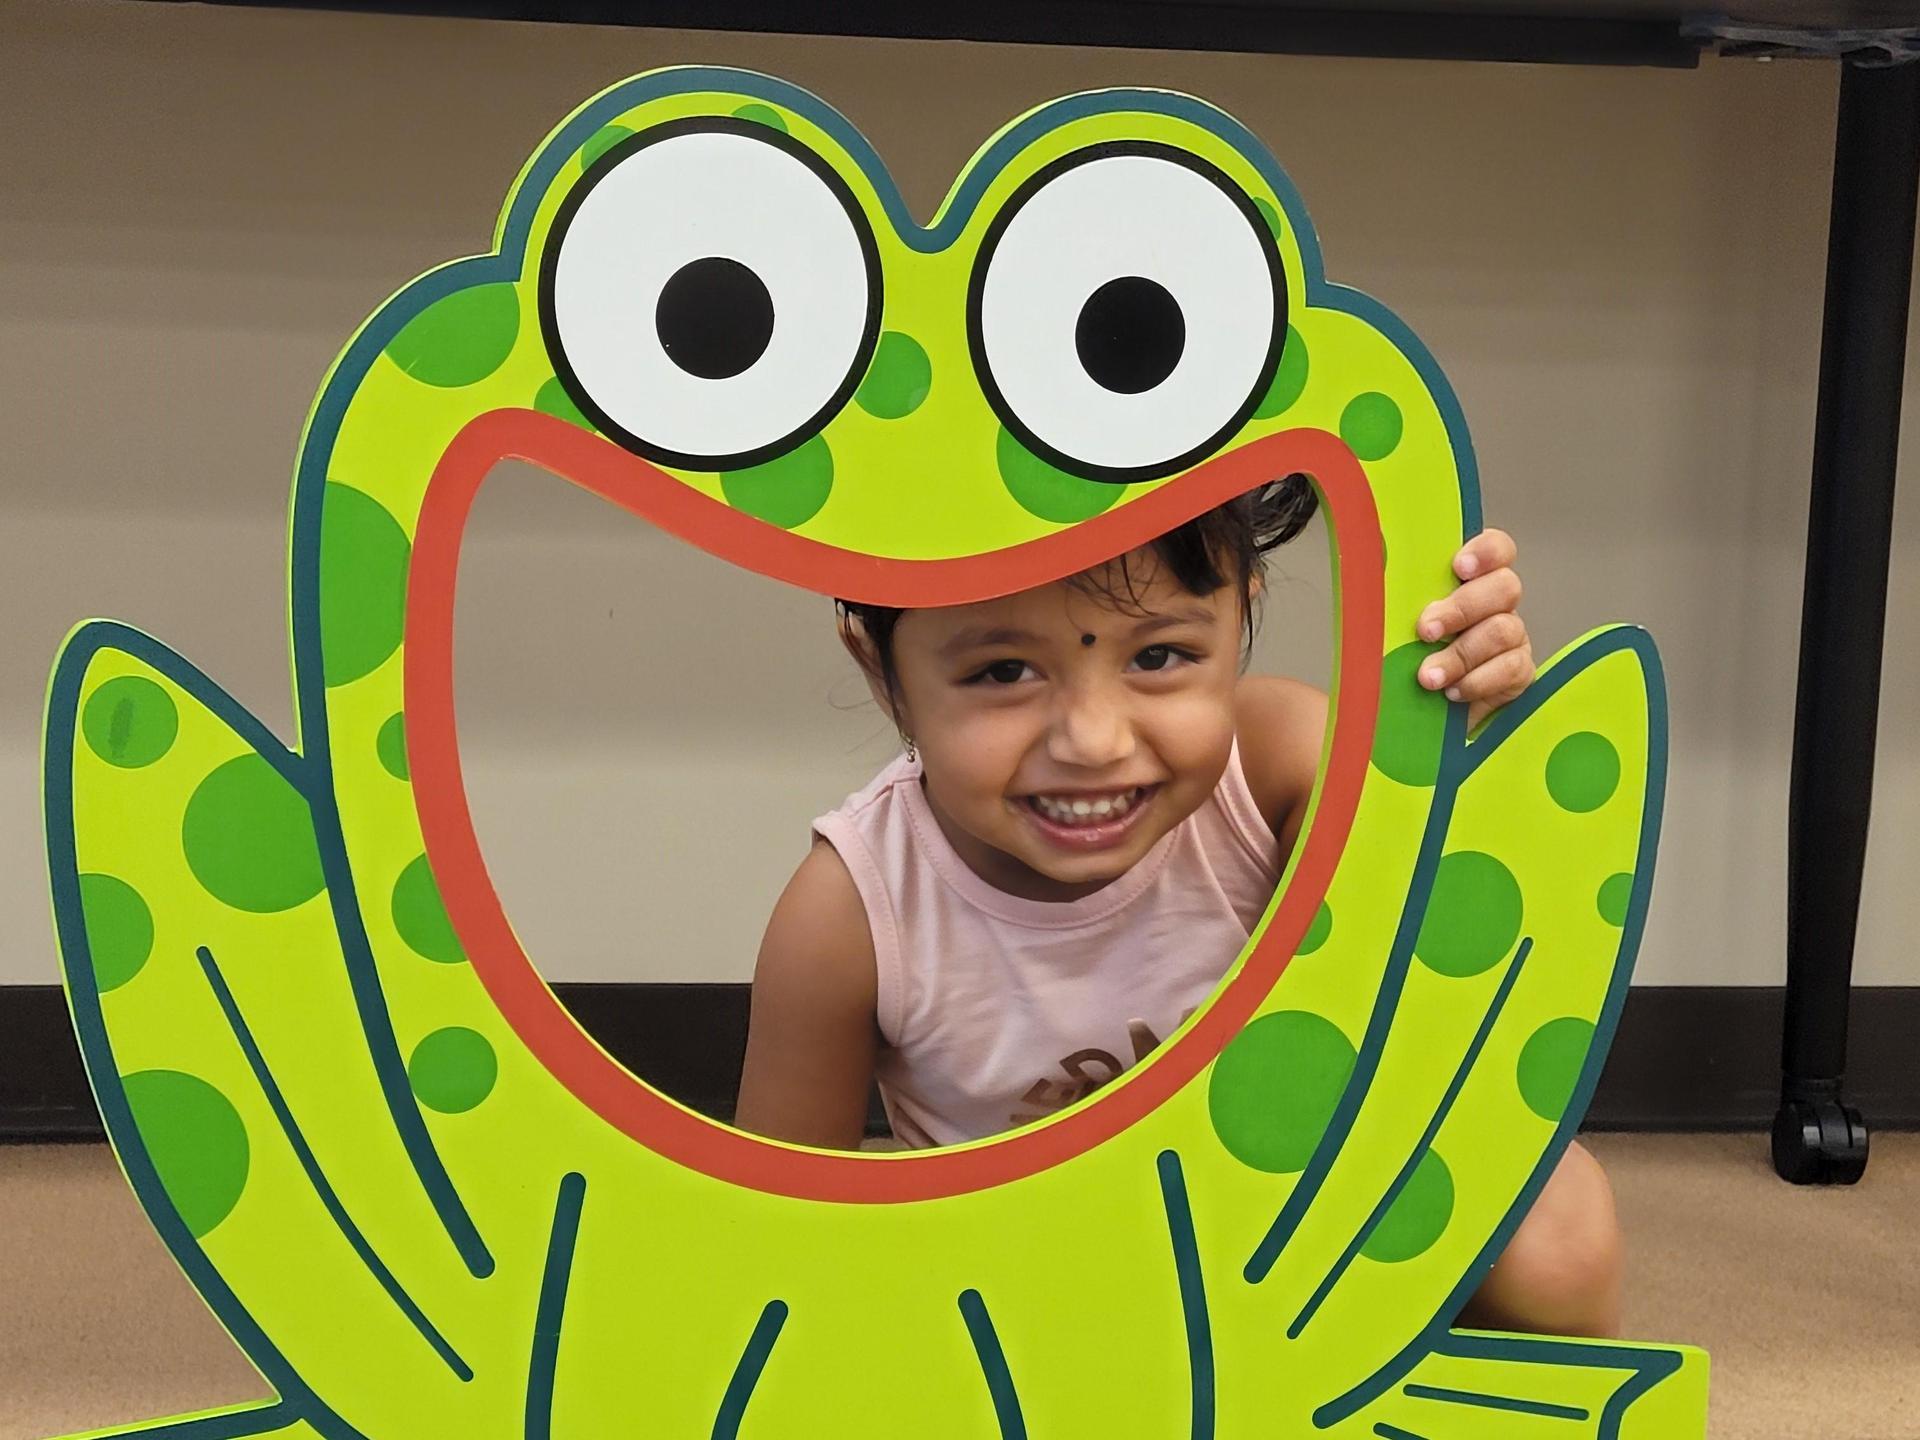 Little girl hides behind frog toss game